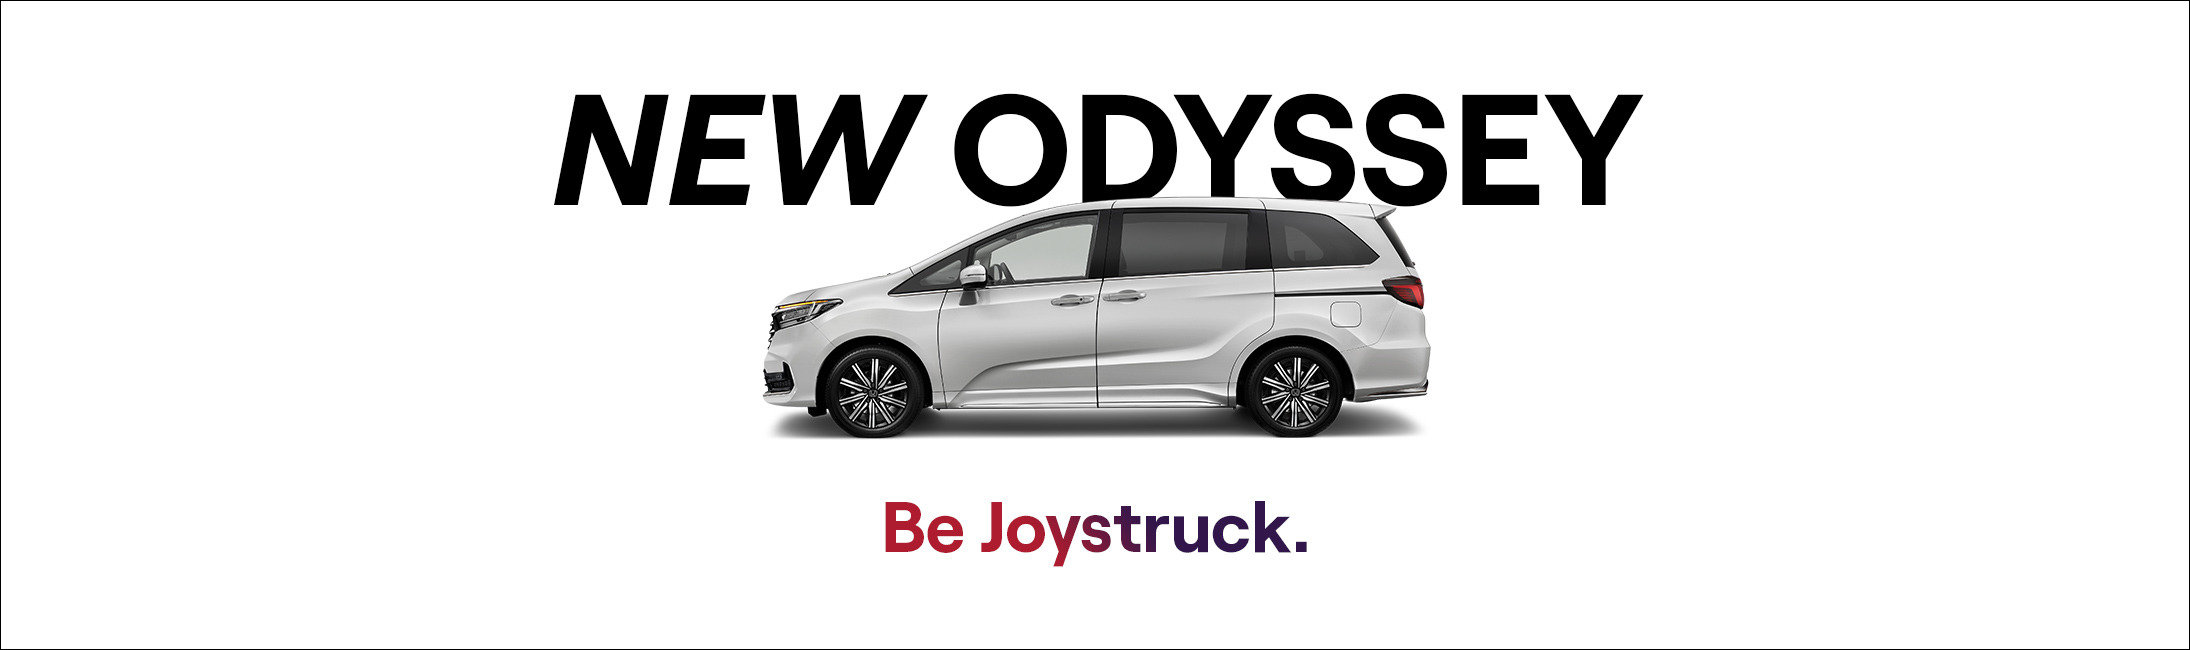 All-New Odyssey